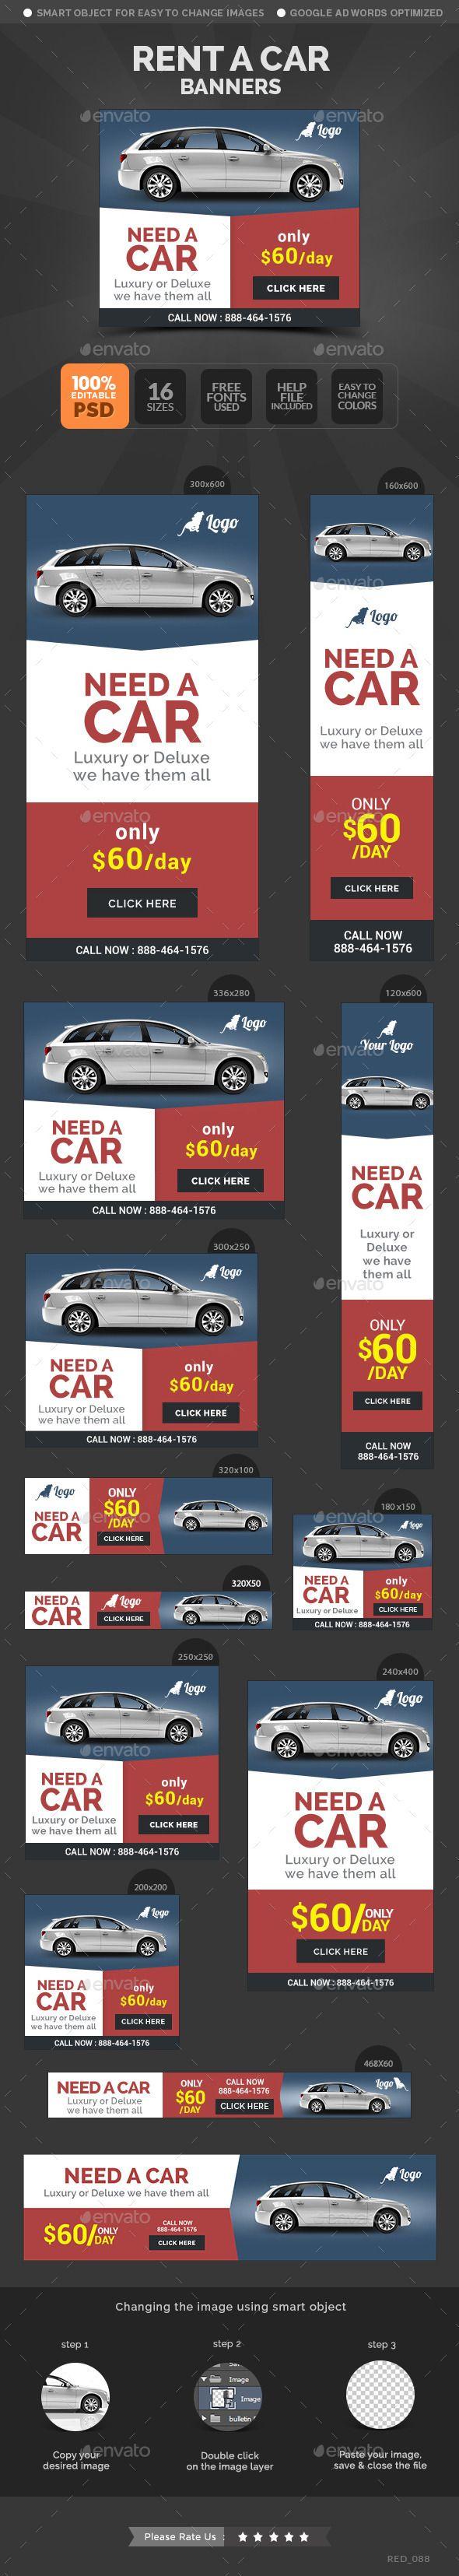 Car rental banners